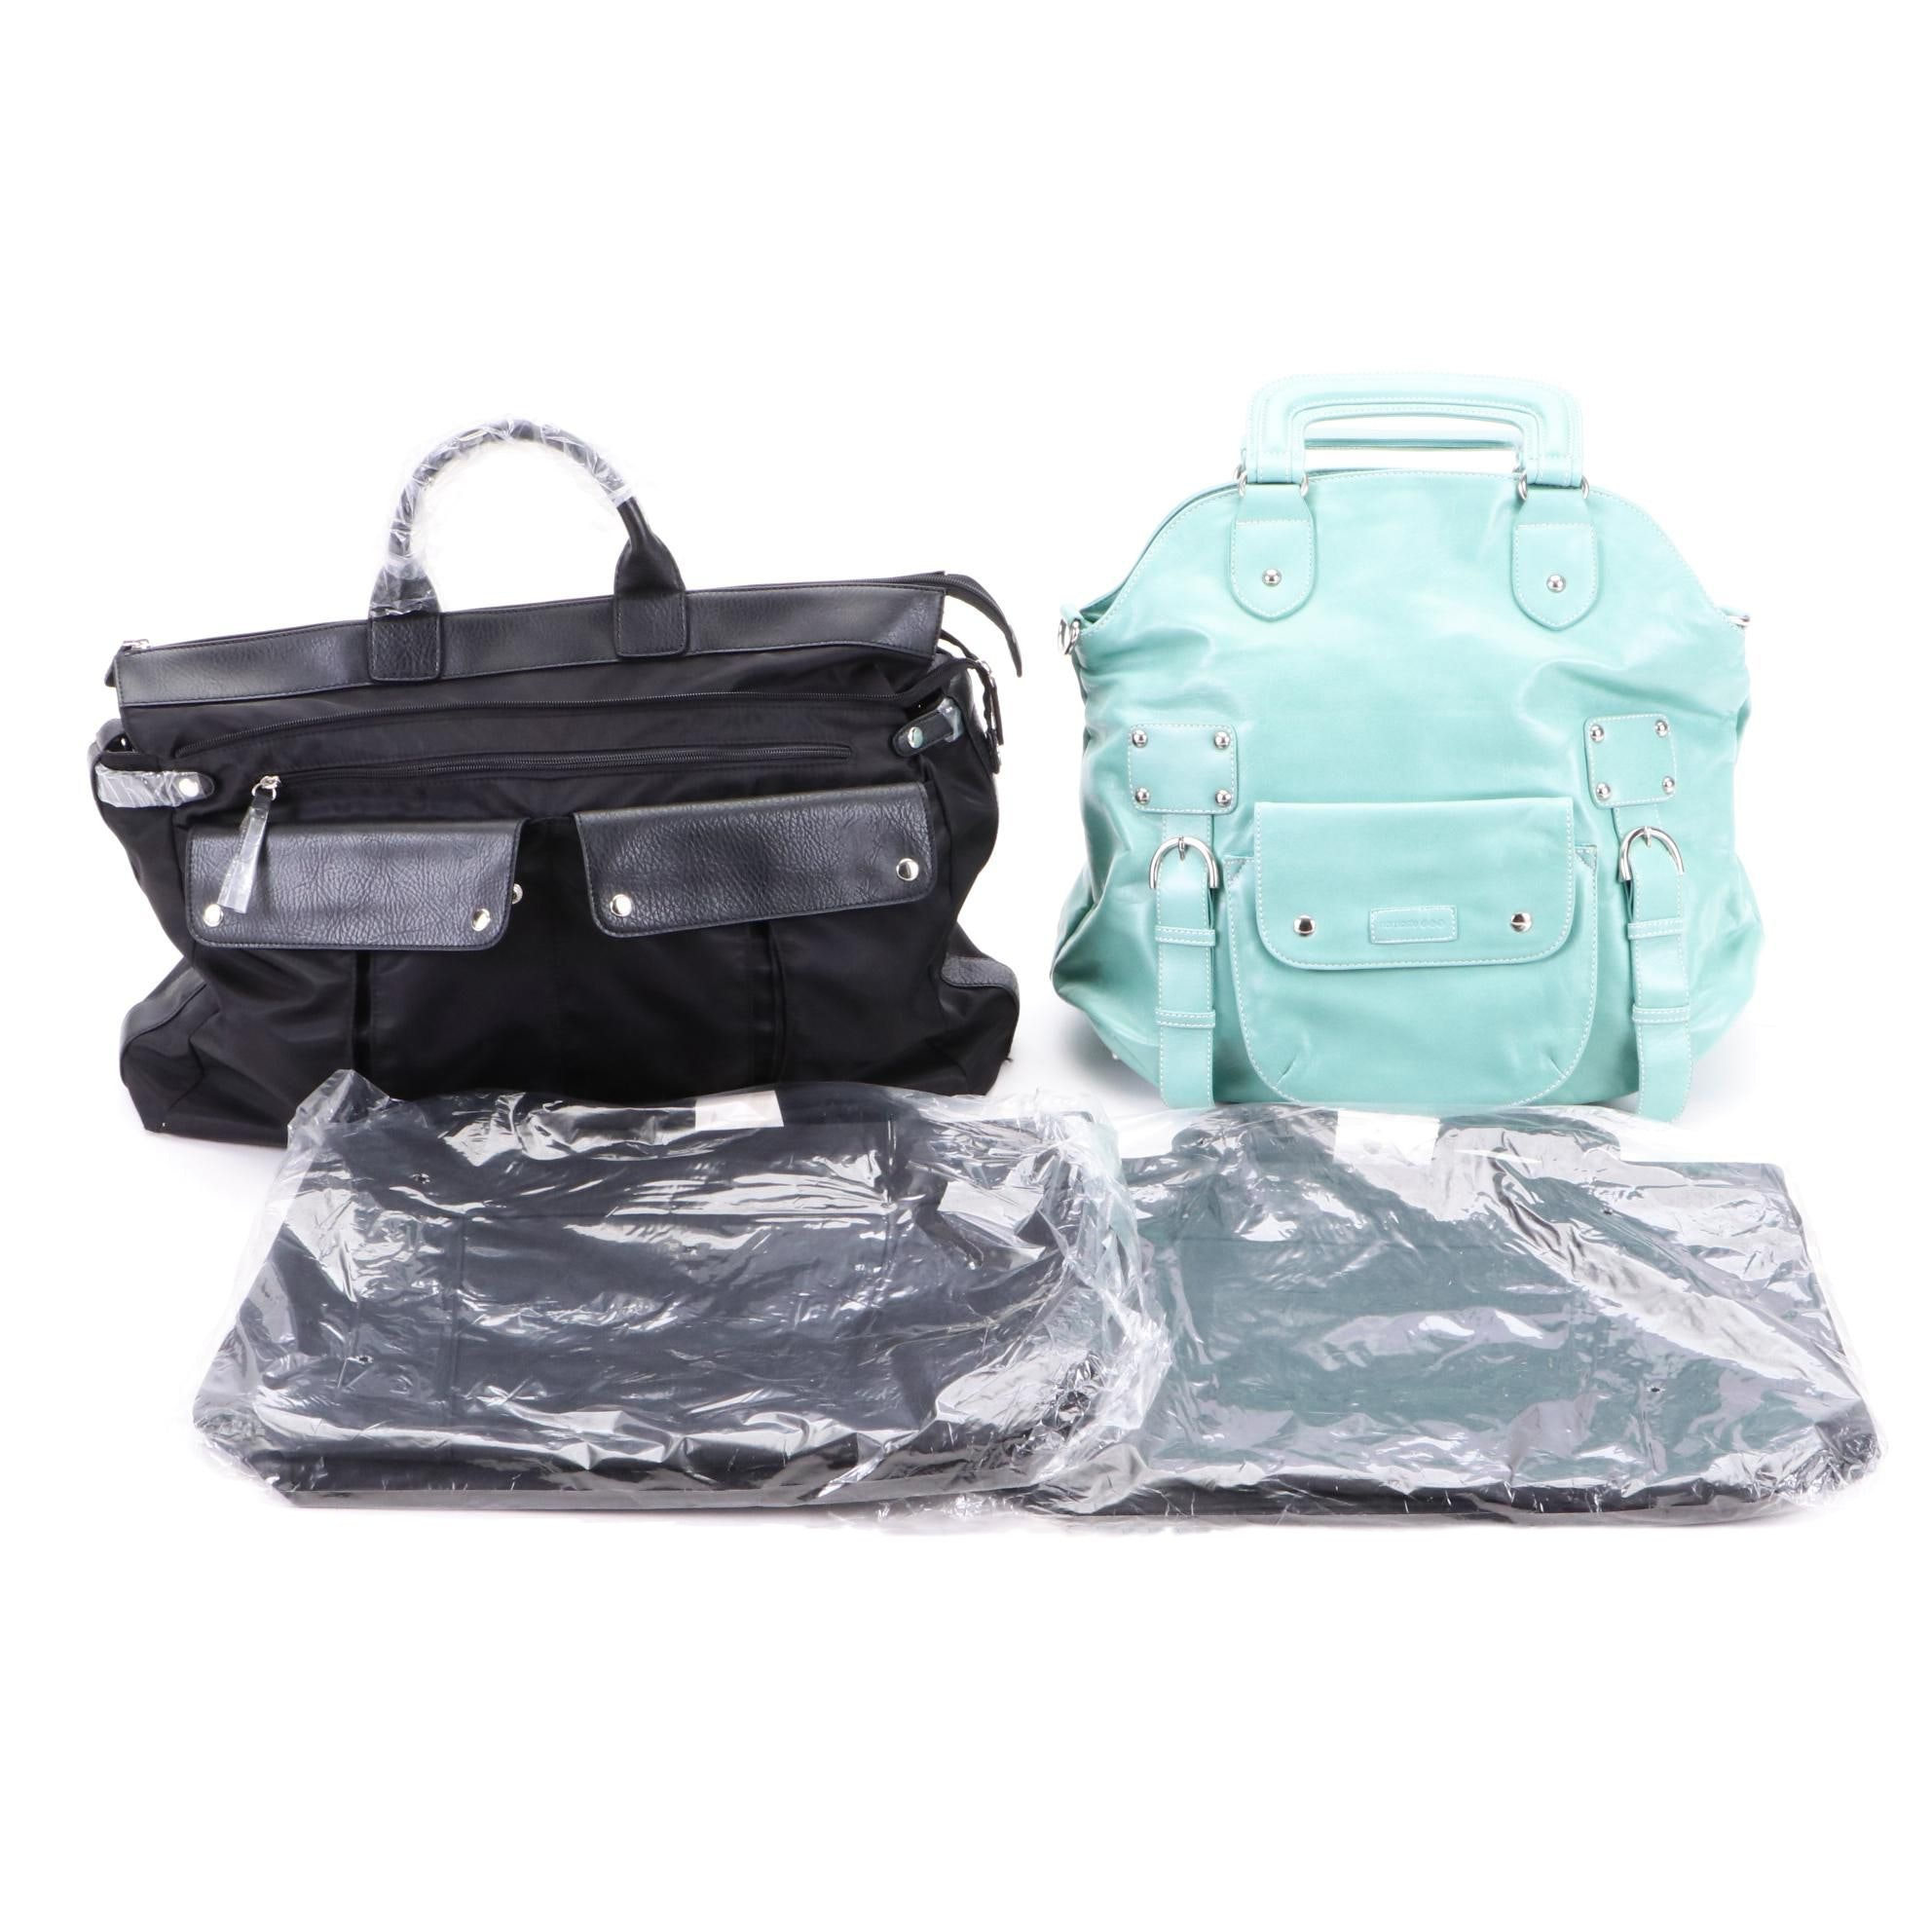 Assortment of Handbags Including Namaste